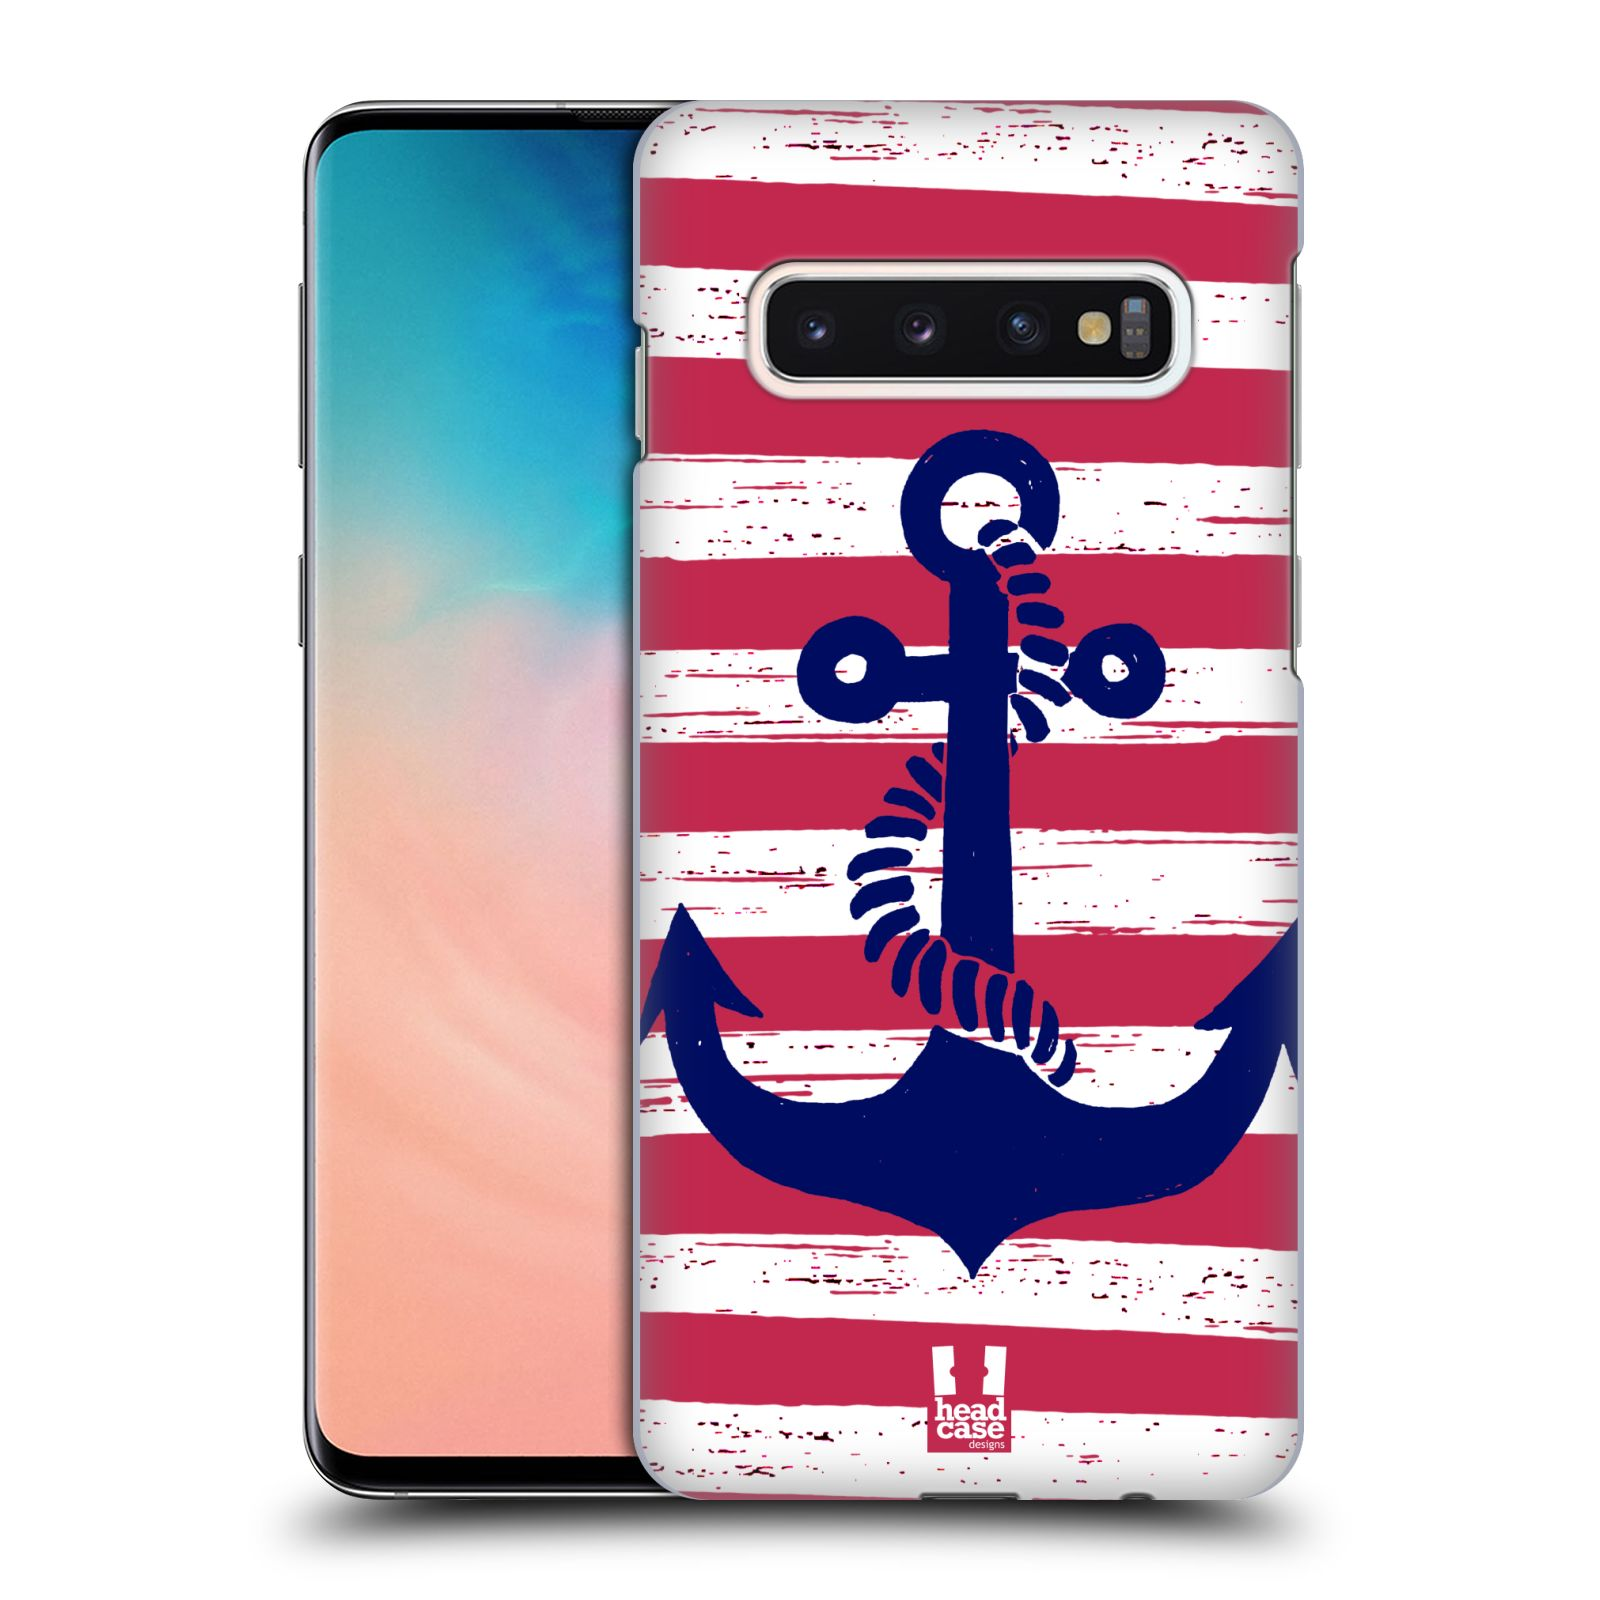 Plastové pouzdro na mobil Samsung Galaxy S10 - Head Case - KOTVA S PRUHY